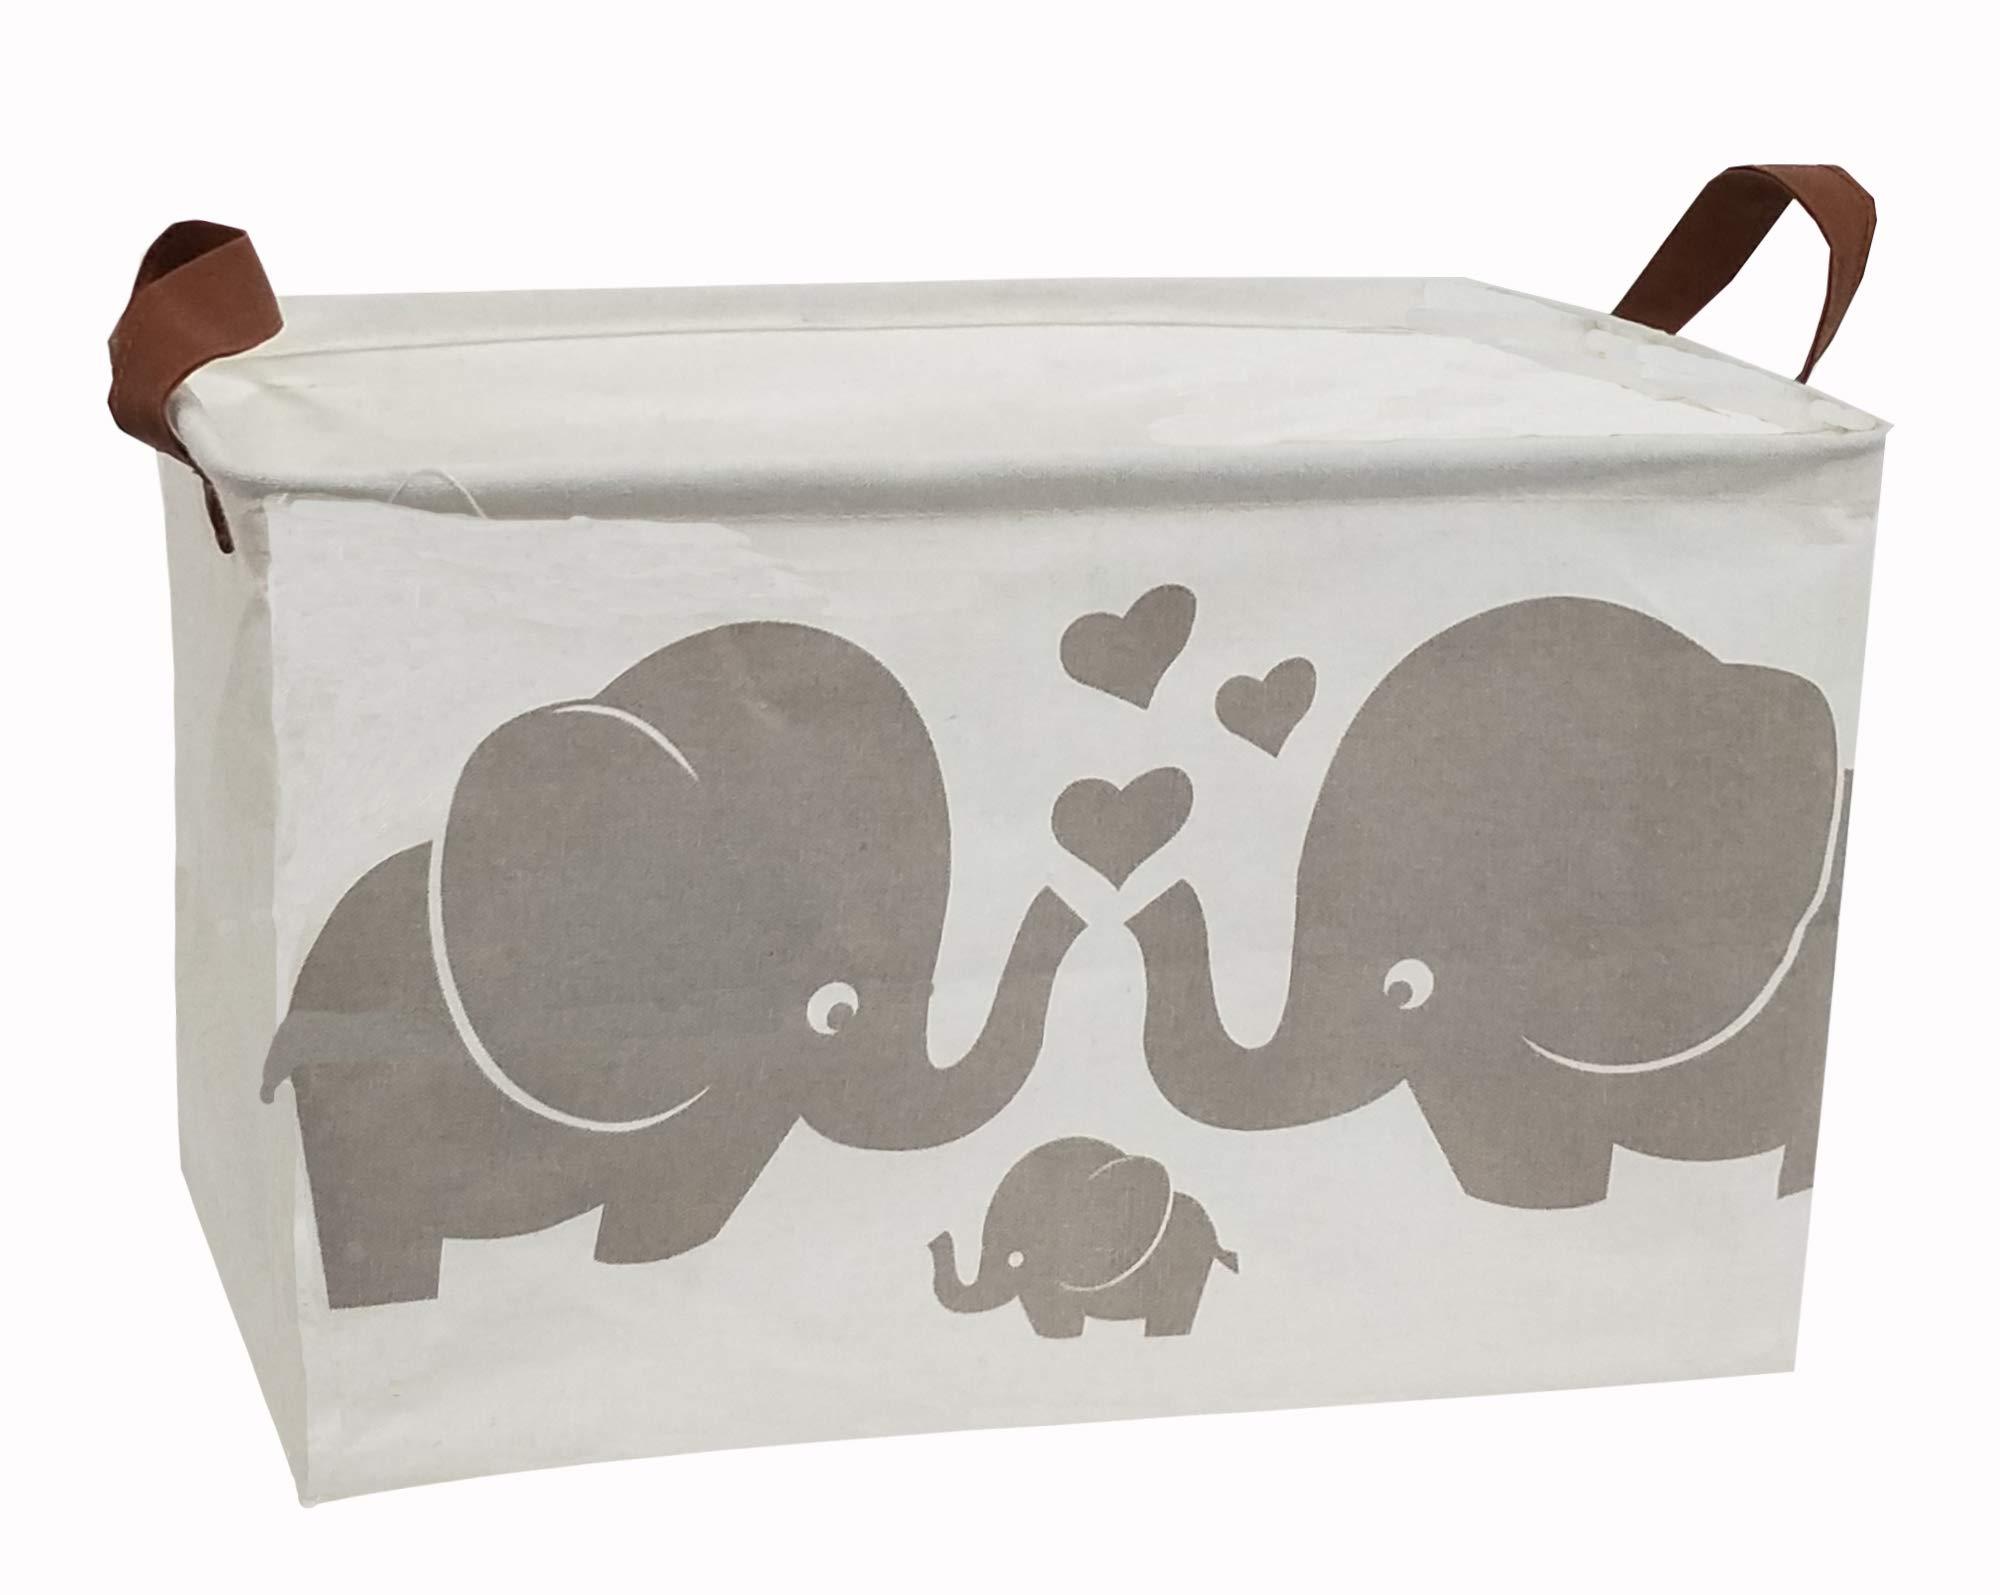 HOUSESTORAGE Laundry Hamper Storage Bin Baskets Foldable Nursery Laundry Basket for Organizing Office//Bedroom//Closet//Shelf Baskets//Storage Hamper Parent-Child Elephant